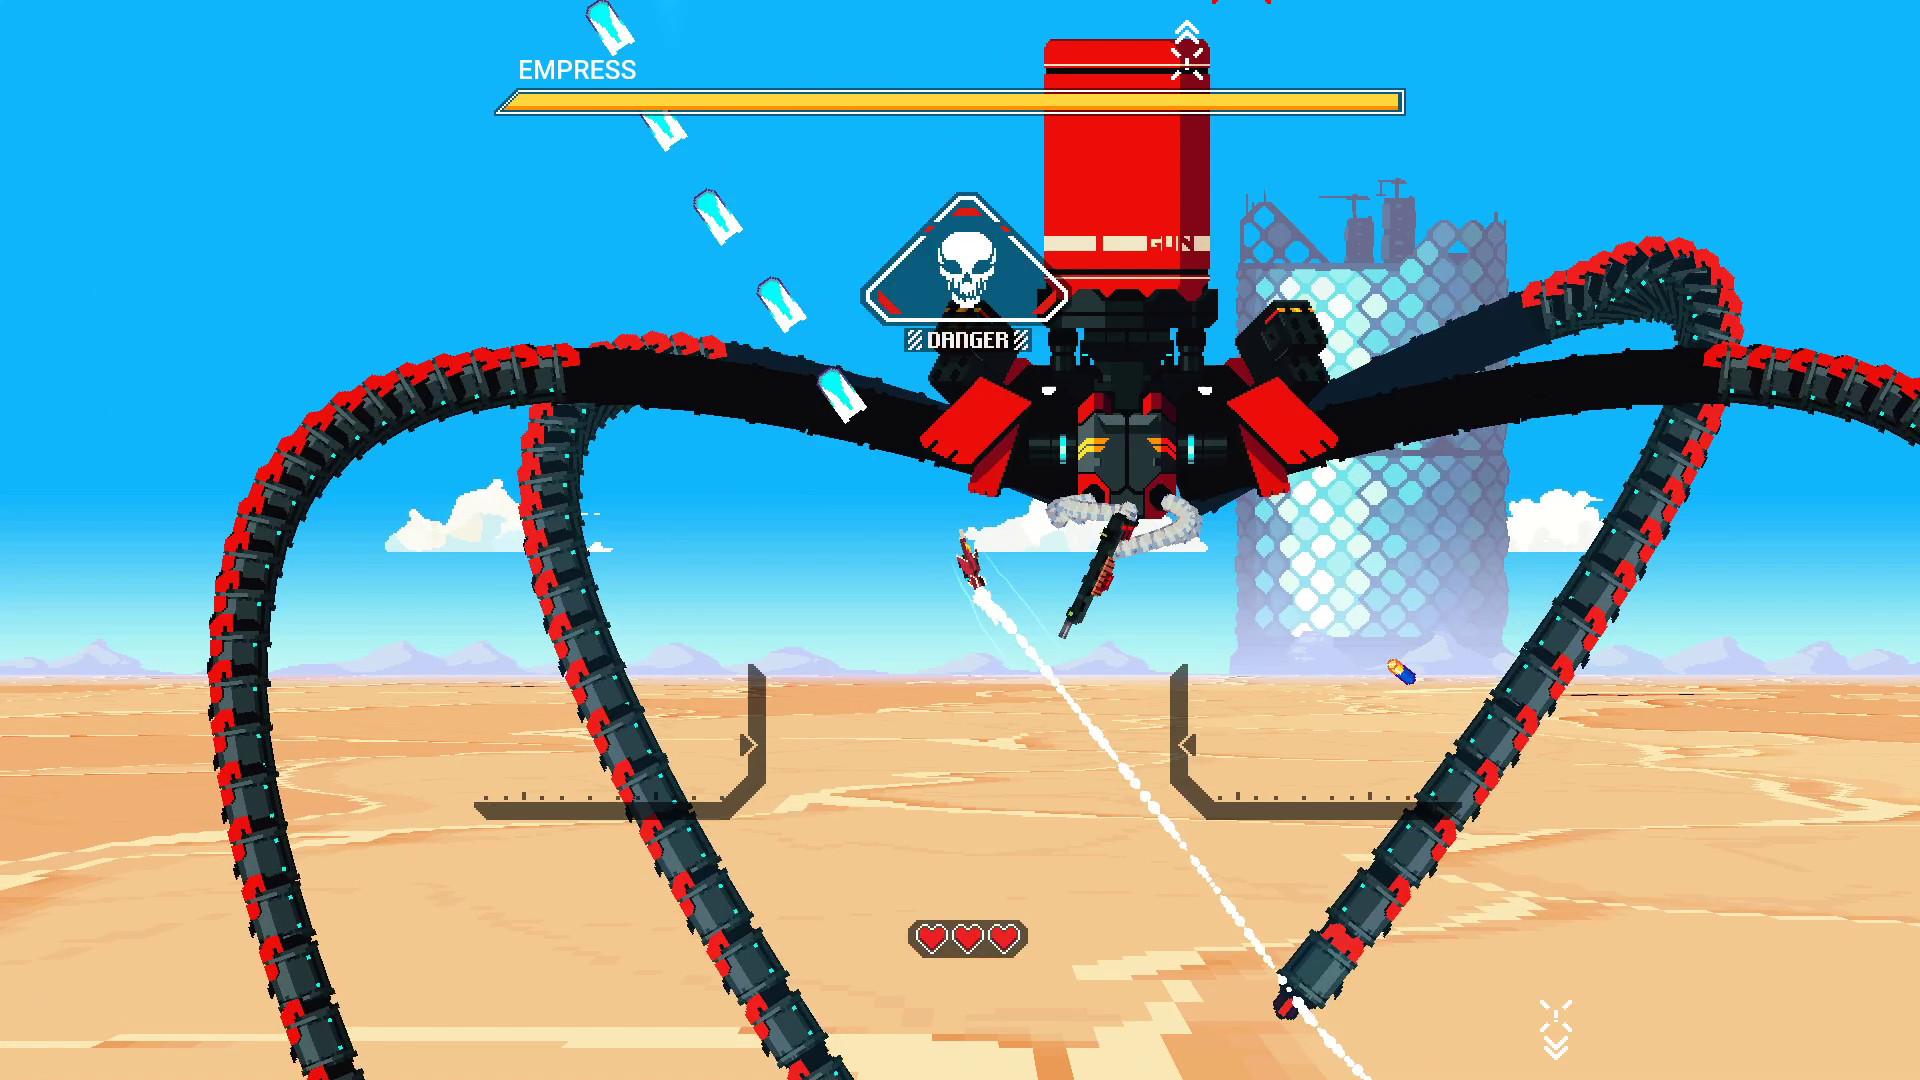 Find the best gaming PC for Jet Lancer